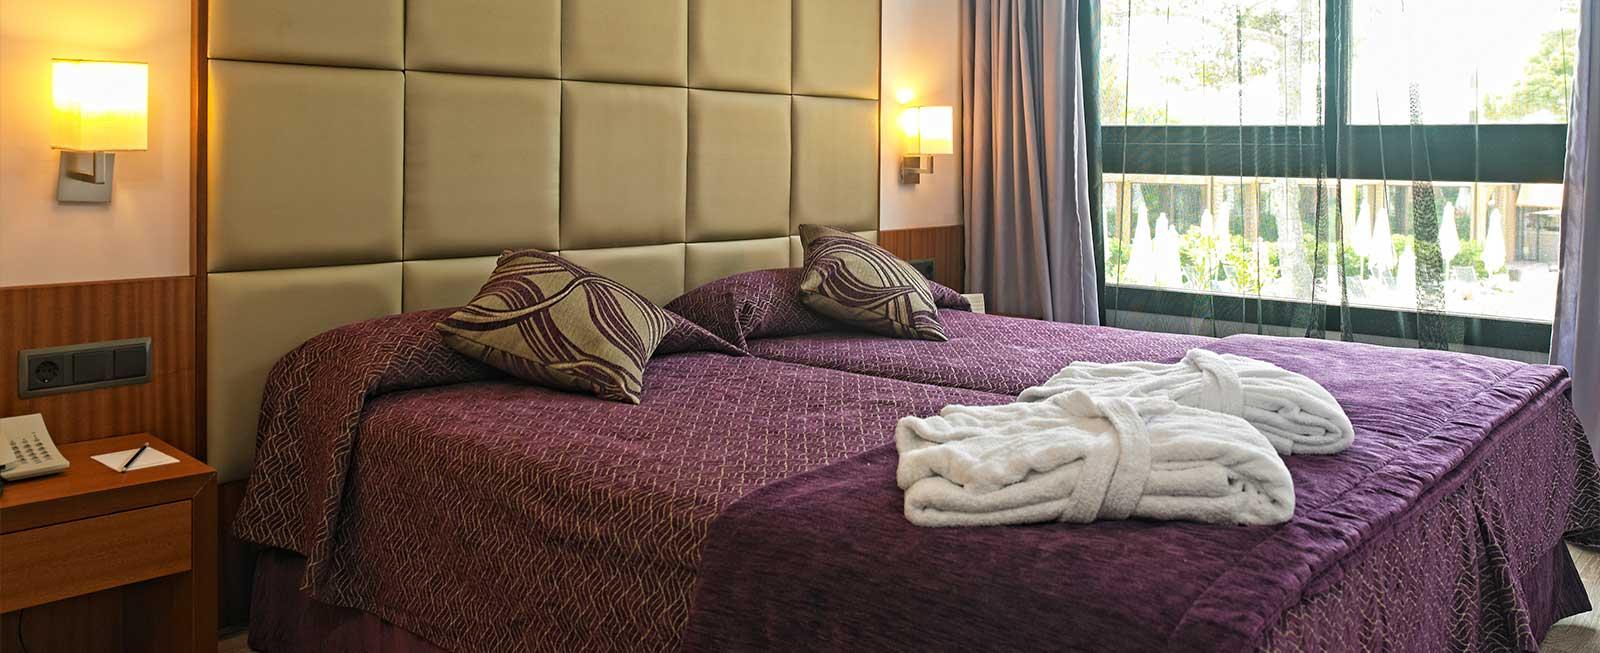 Junior Suite Select Protur Turo Pins Hotel Spa Cala Rajada